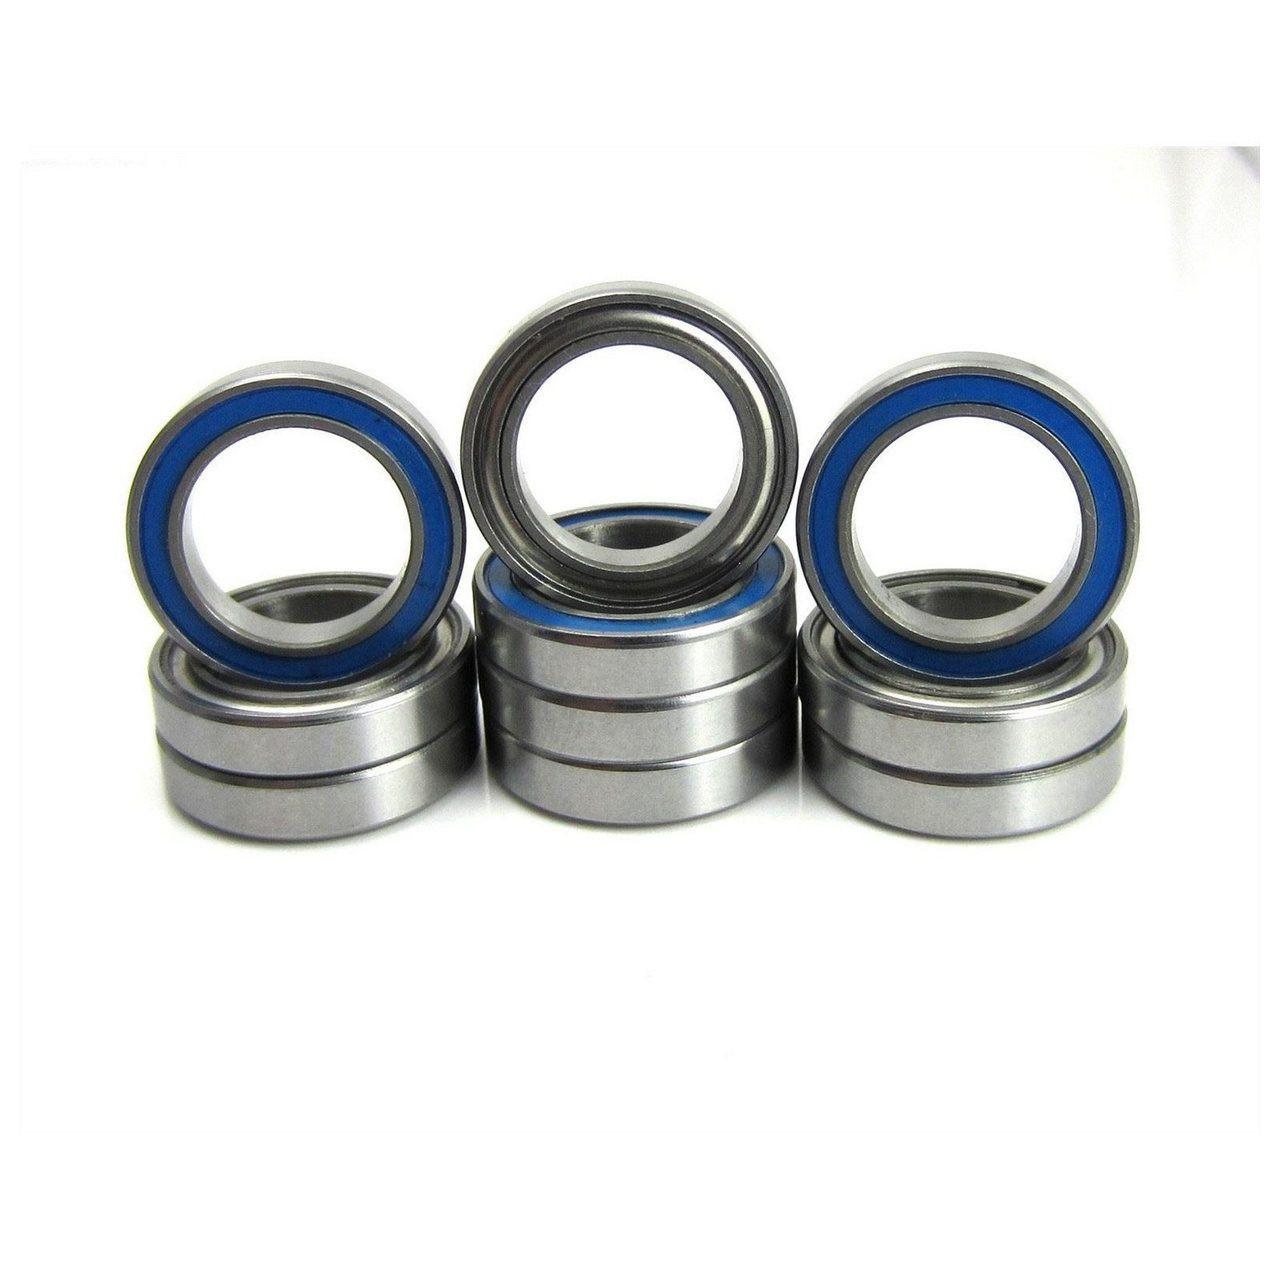 TRB RC 1/2x3/4x5/32 Precision Ball Bearings ABEC 5 Hybrid Seals (10)